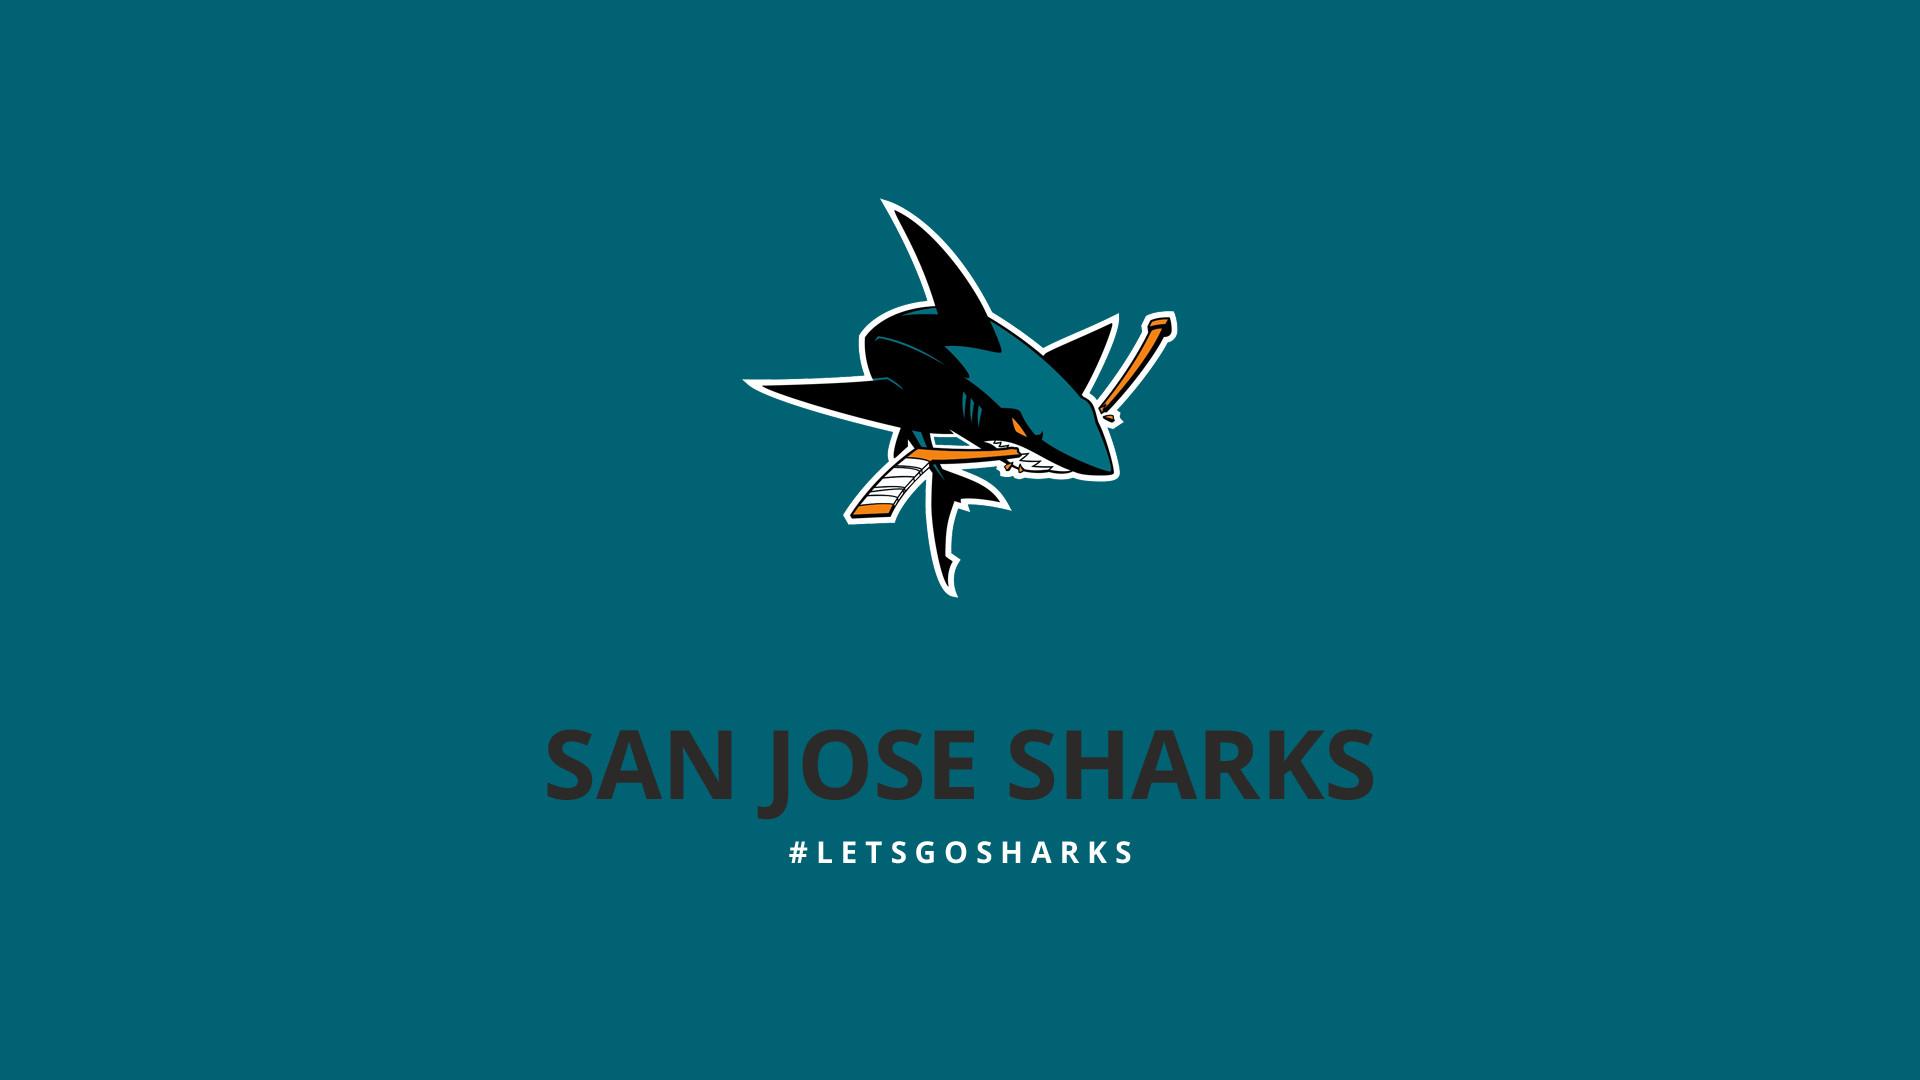 San Jose Sharks HD Wallpaper (65+ Images